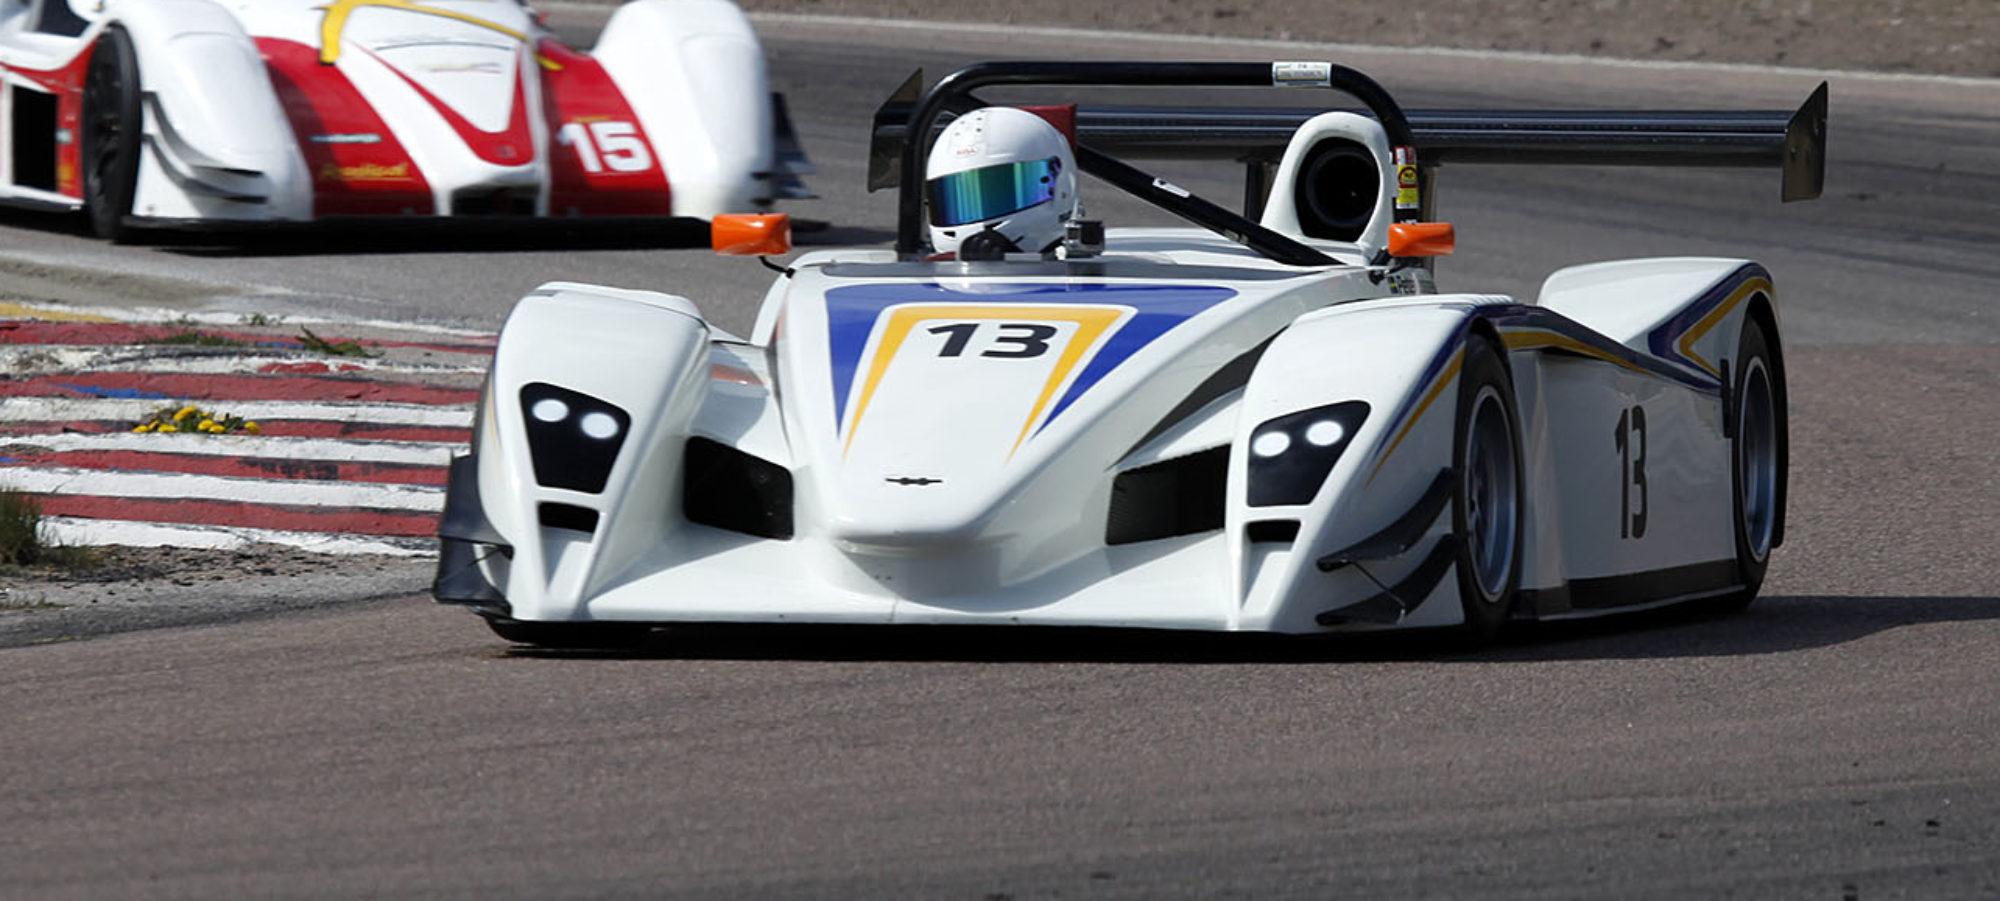 Pj-Racing